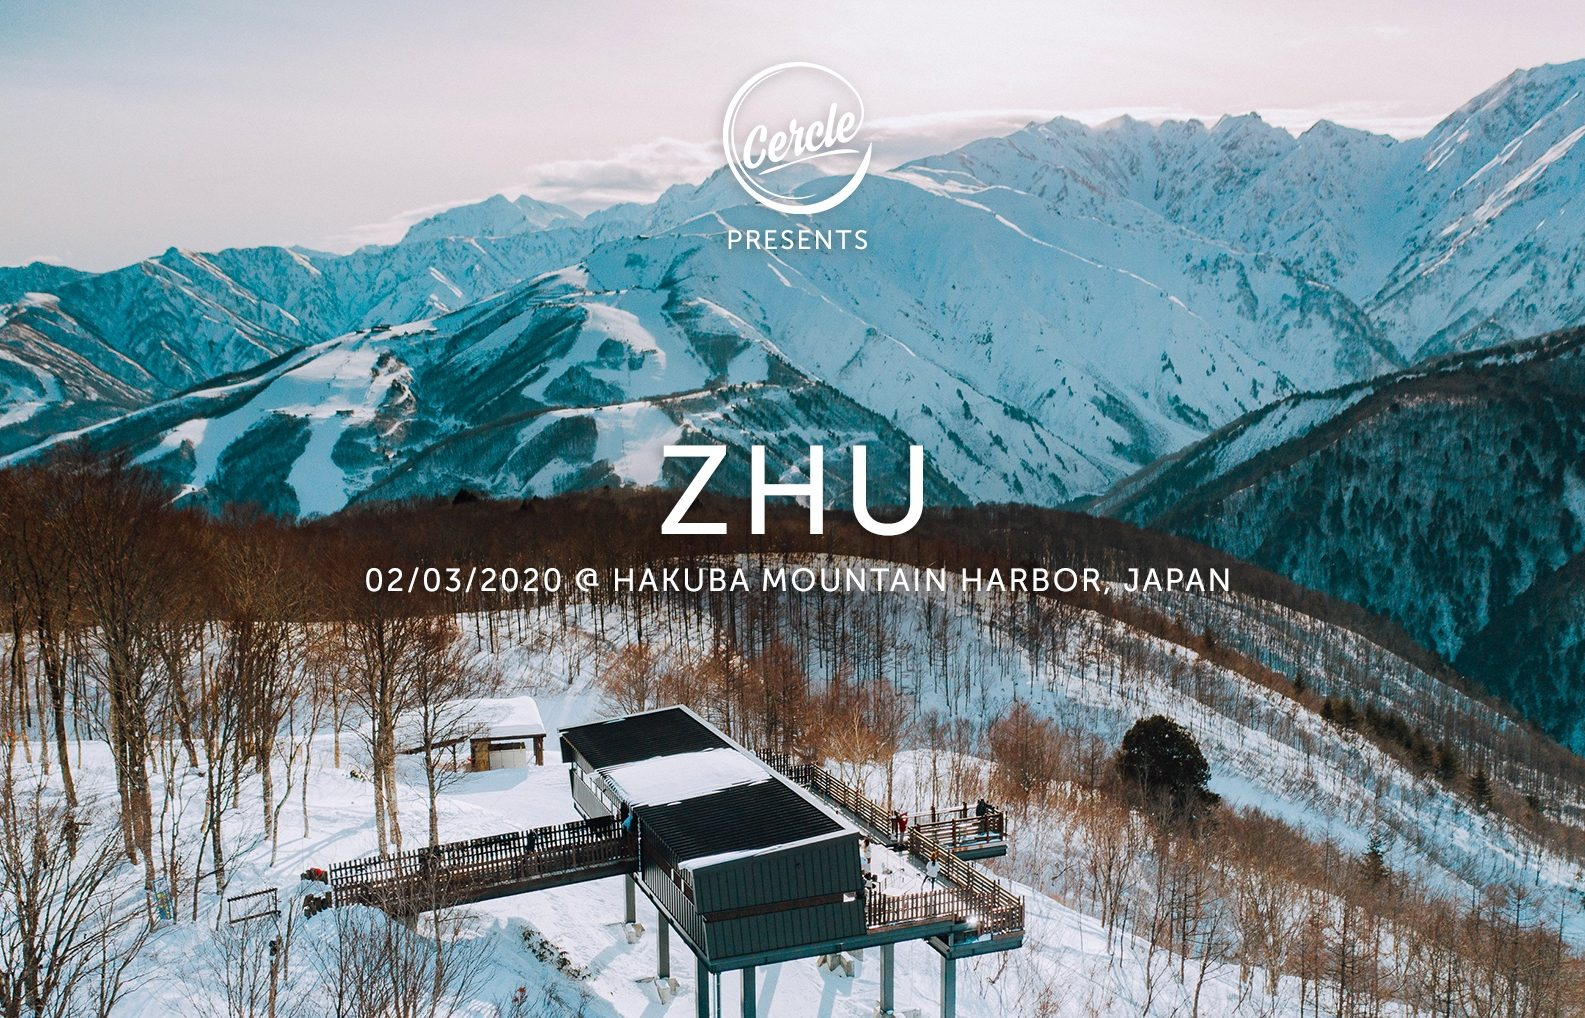 ZHUも出演決定!ライブストリーミングメディア「Cercle」×「Snow Machine」のイベントに登場!